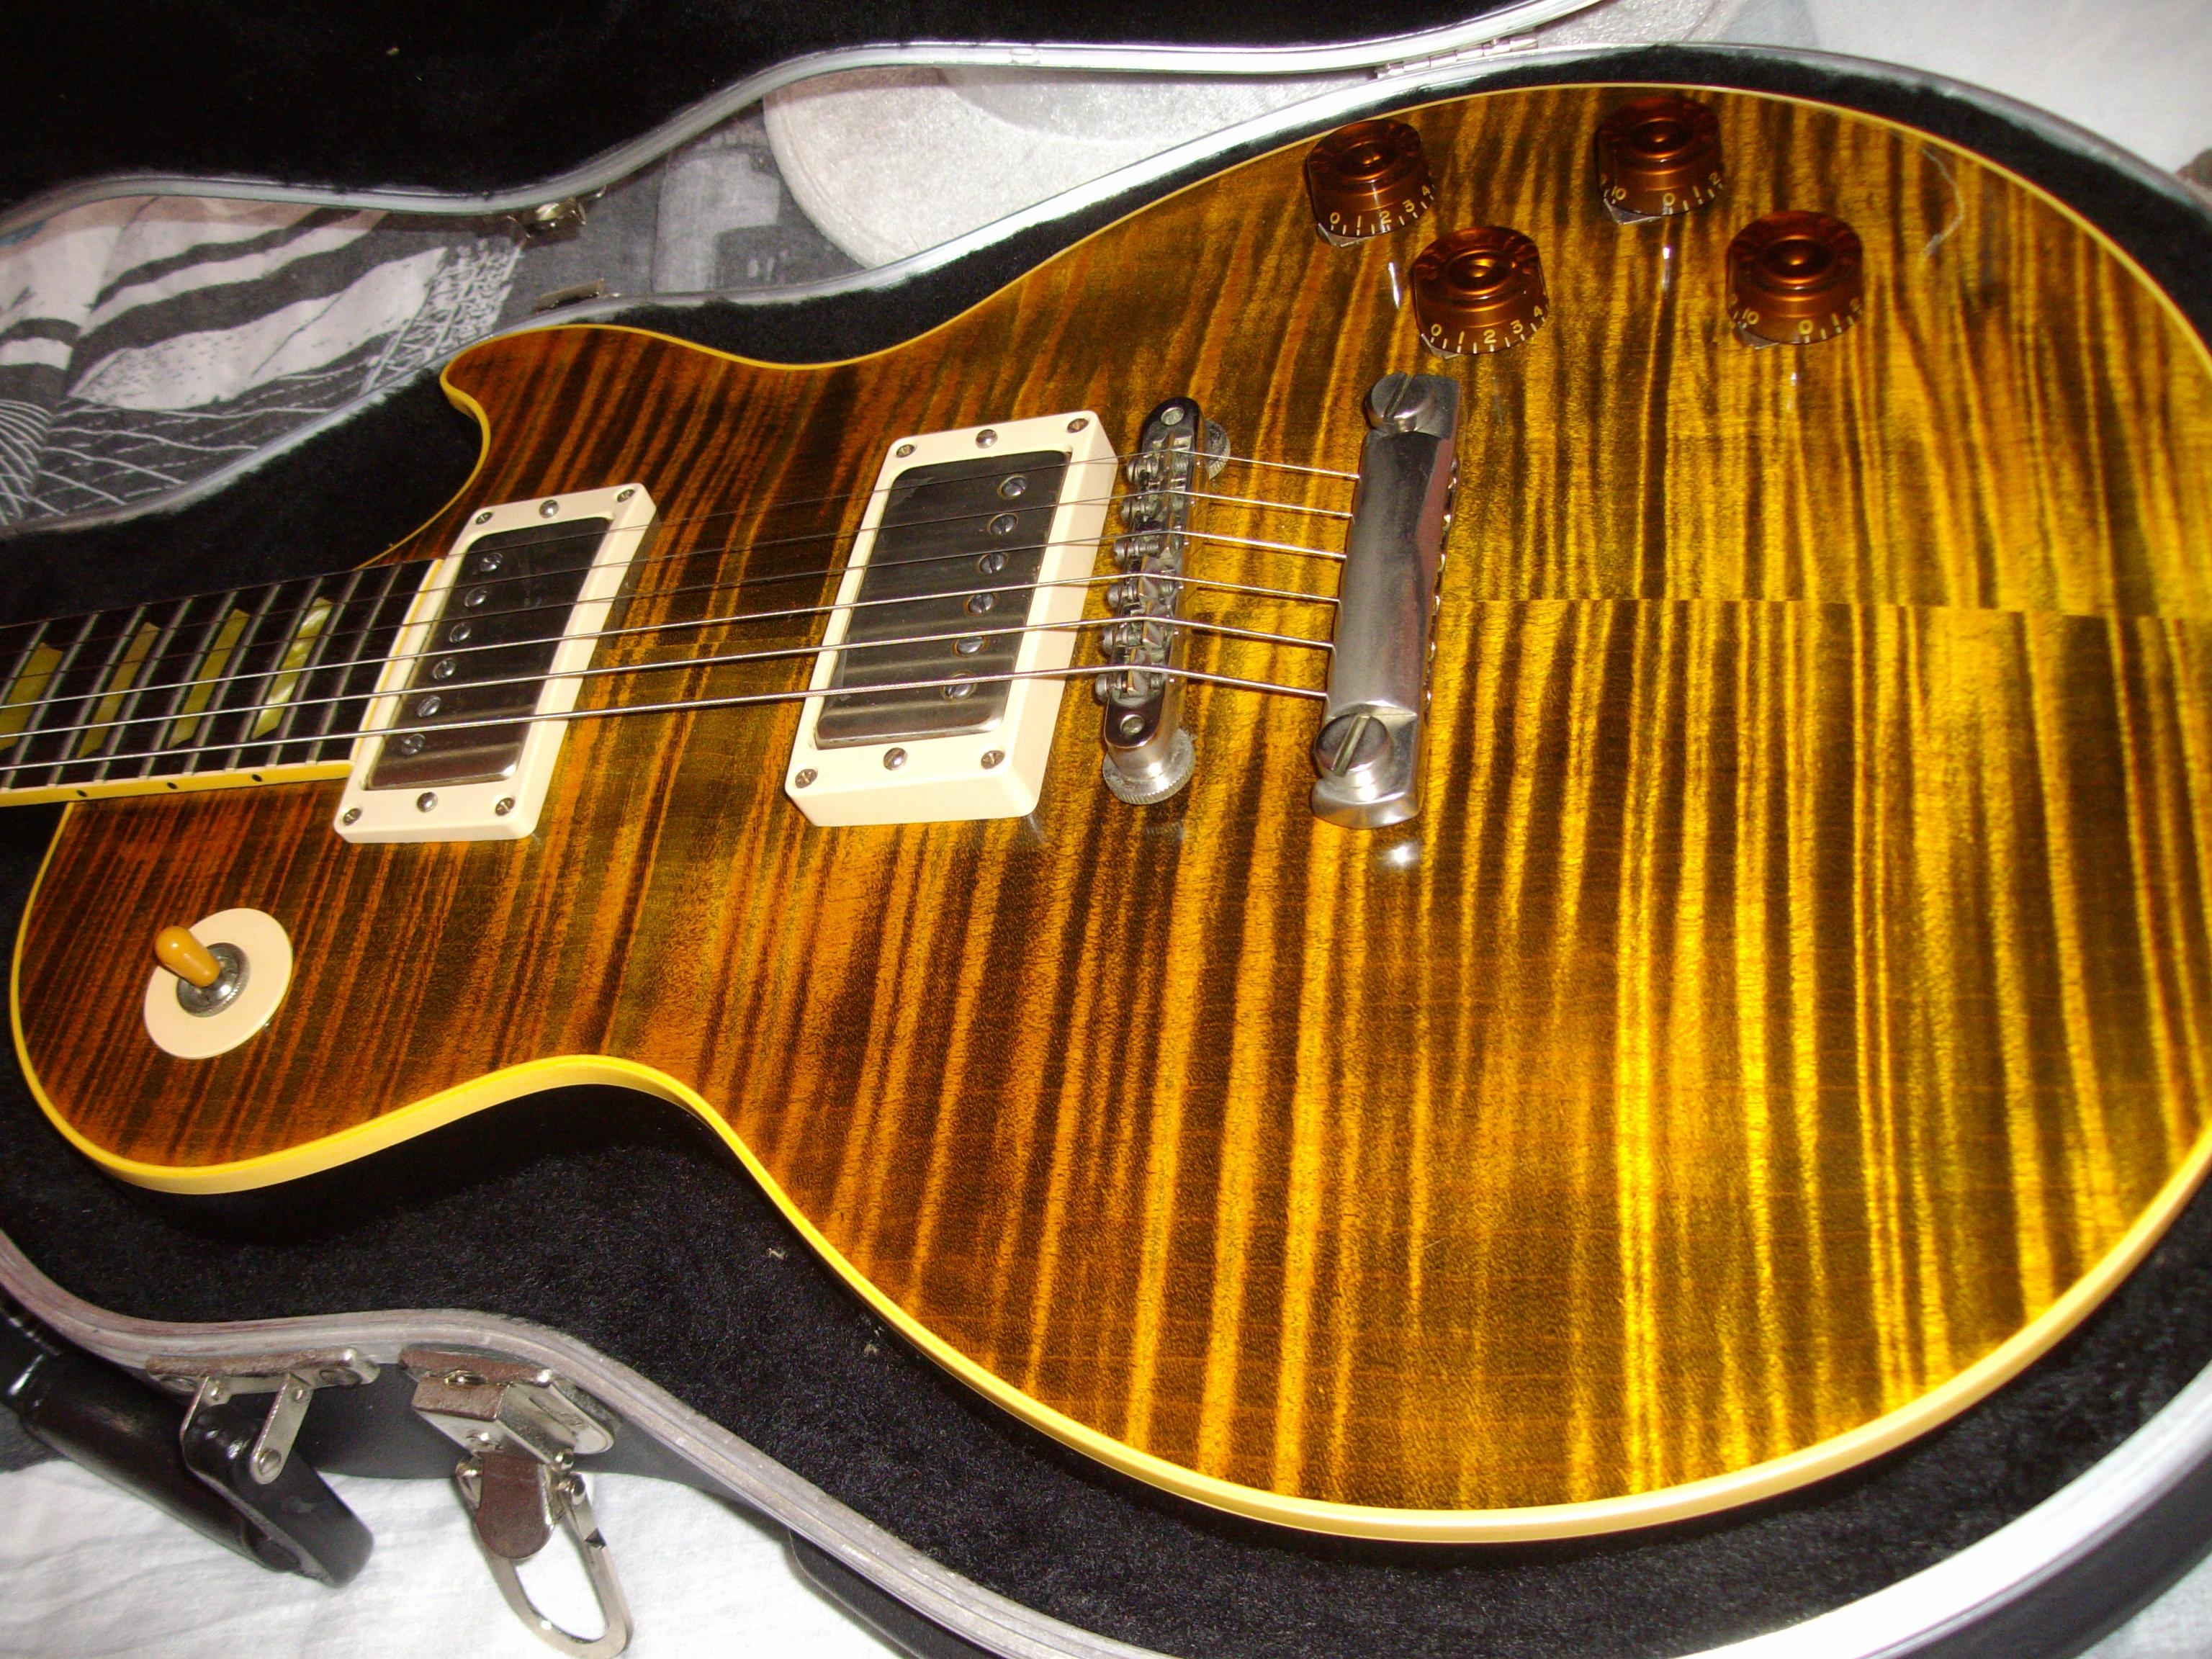 Gibson Joe Perry Boneyard Les Paul Green Tiger With